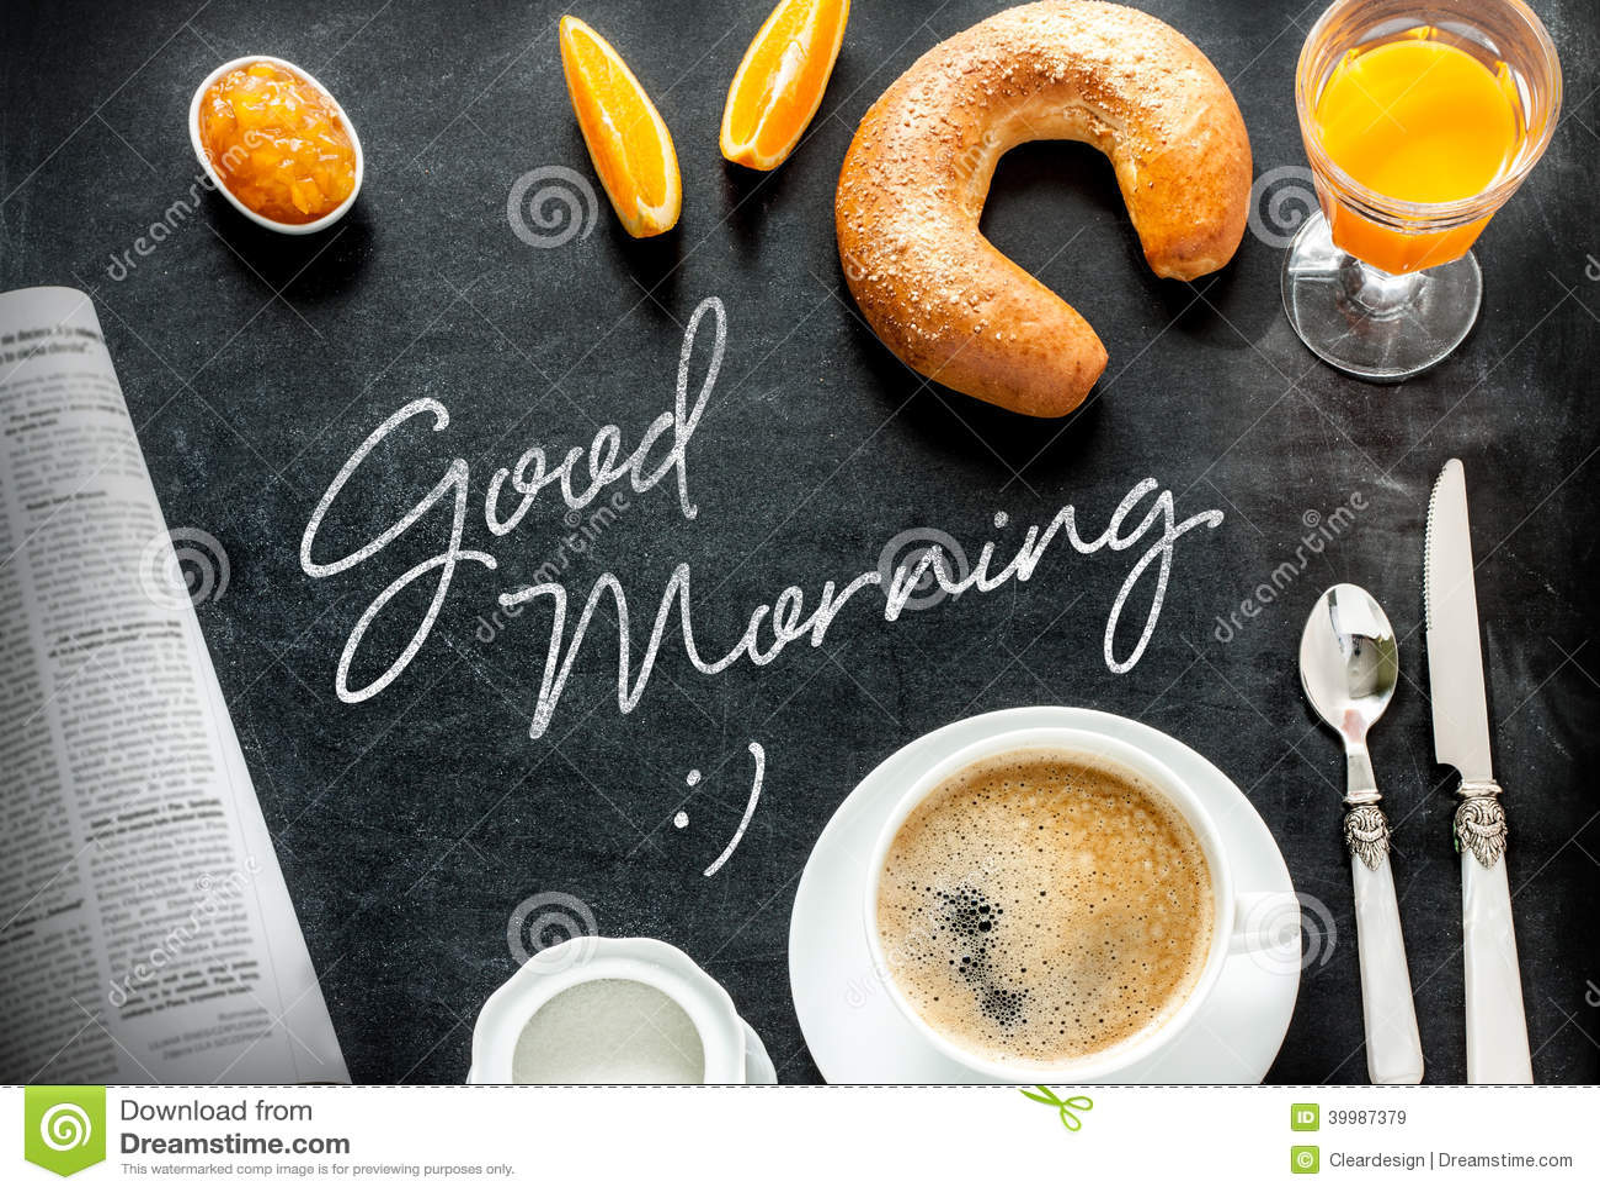 Continentaal ontbijt op zwart bord